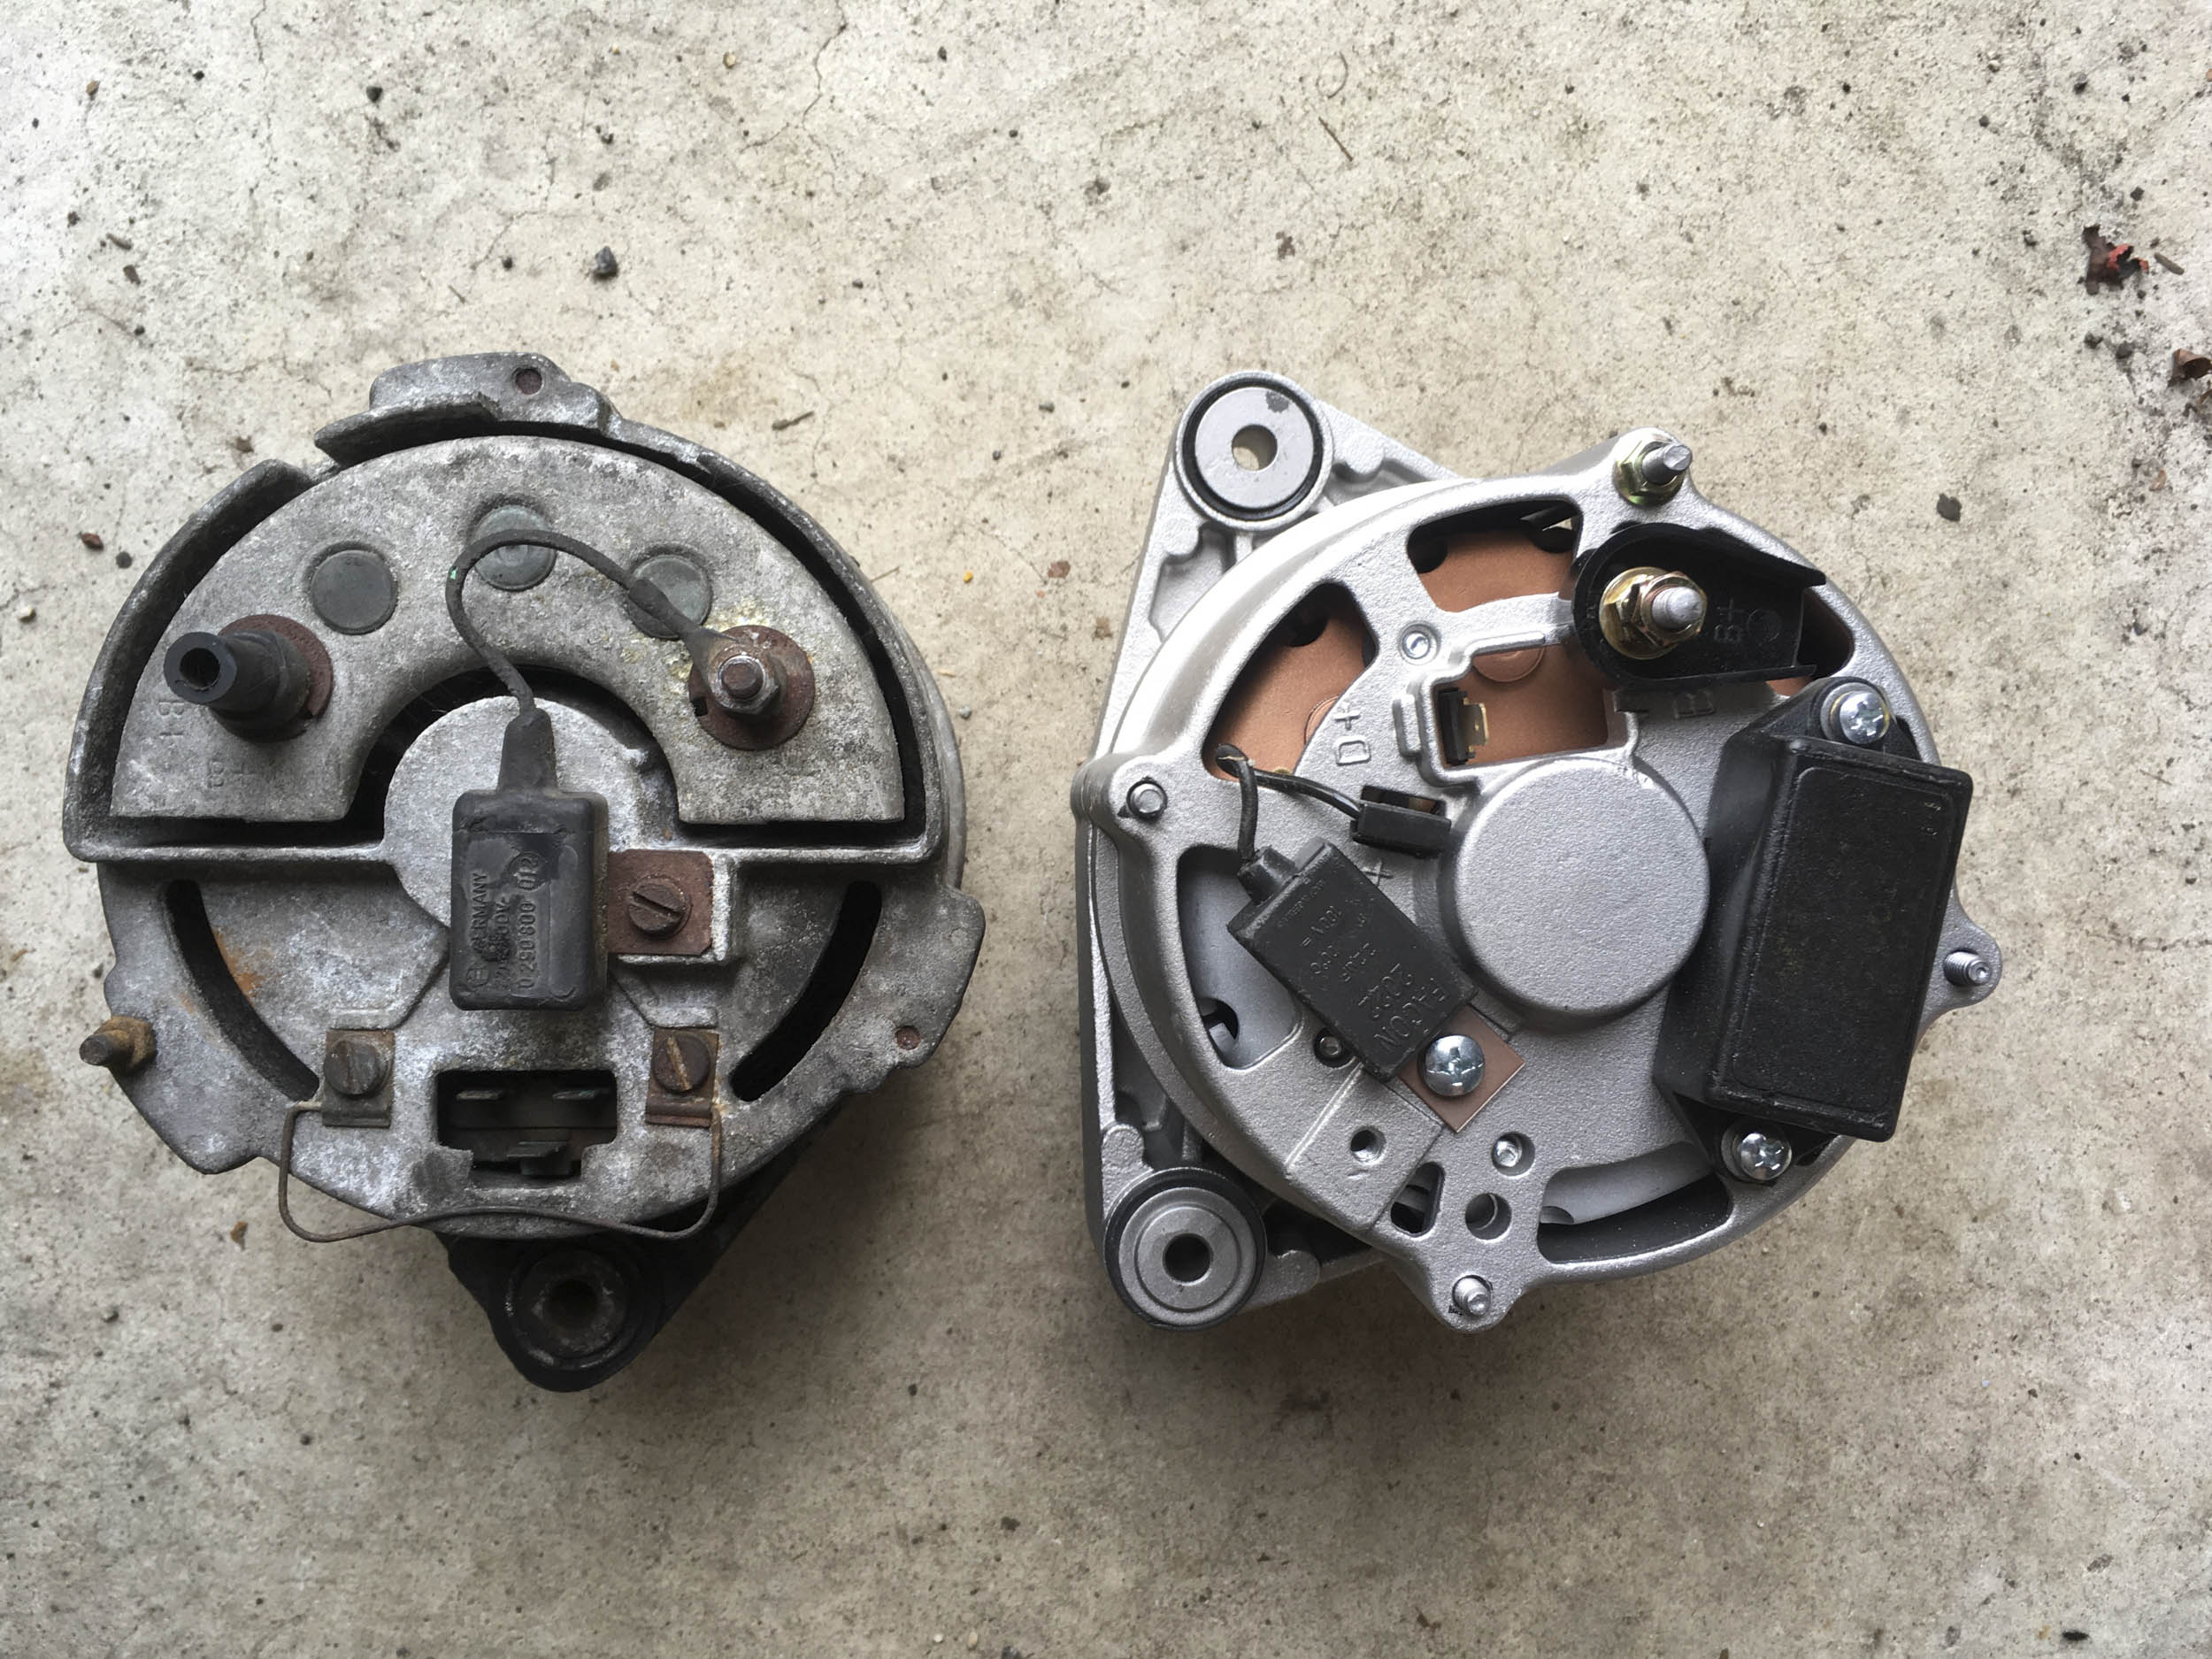 Original alternator (left) and new internally-regulated alternator (right).